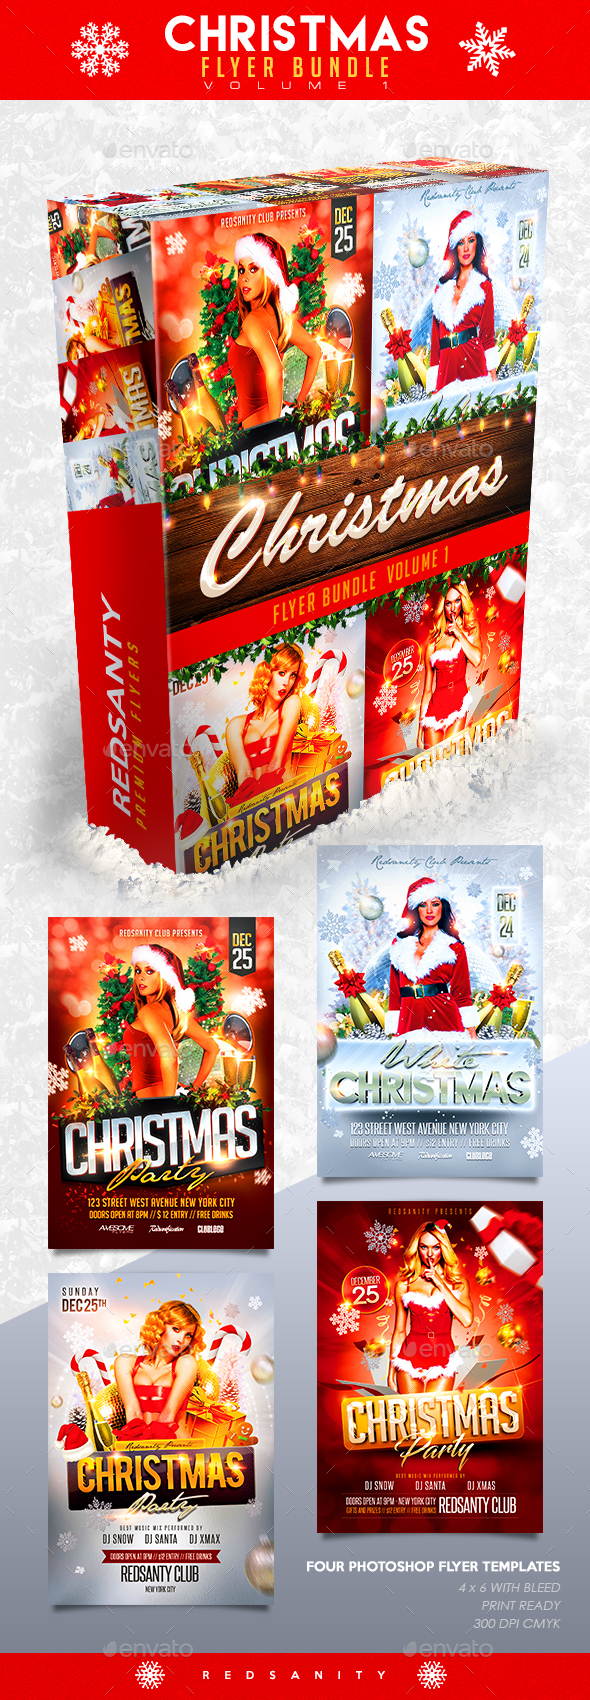 GraphicRiver Christmas Flyer Bundle Vol.1 20941395